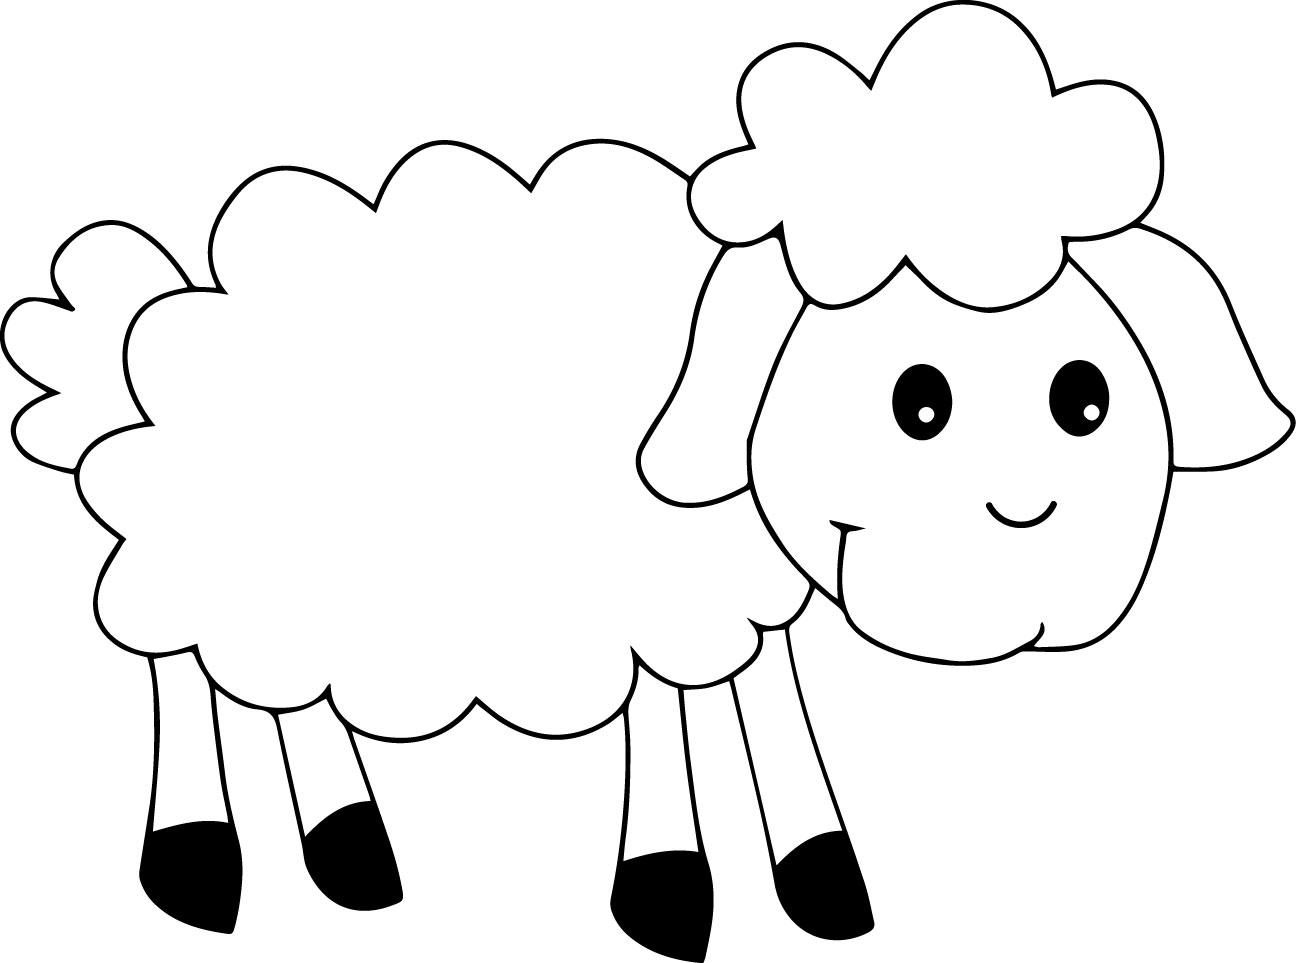 Cute Sheep Coloring Page Wecoloringpage